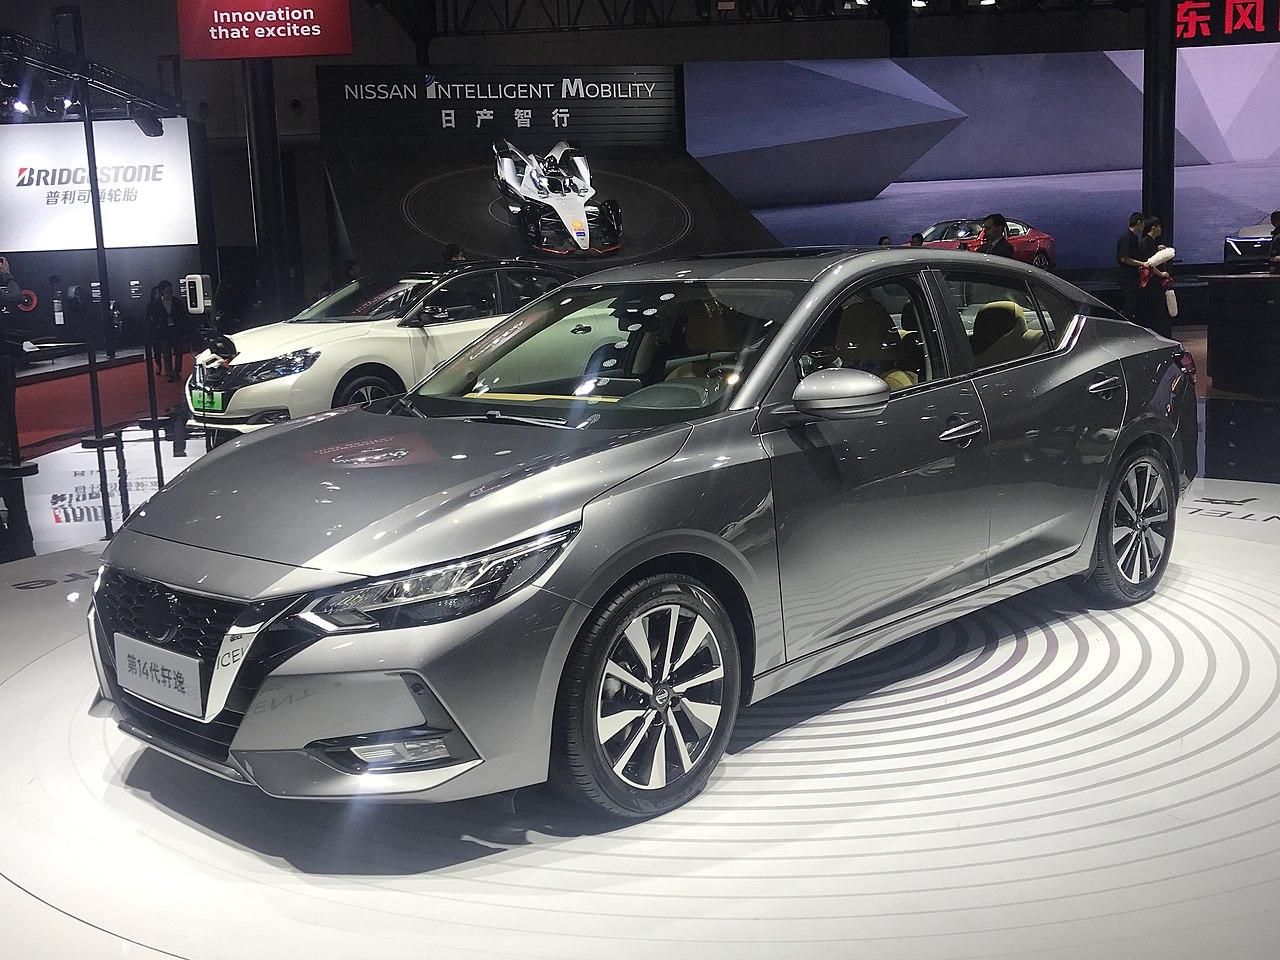 2020 Sentra - Nissan Forum | Nissan Forums